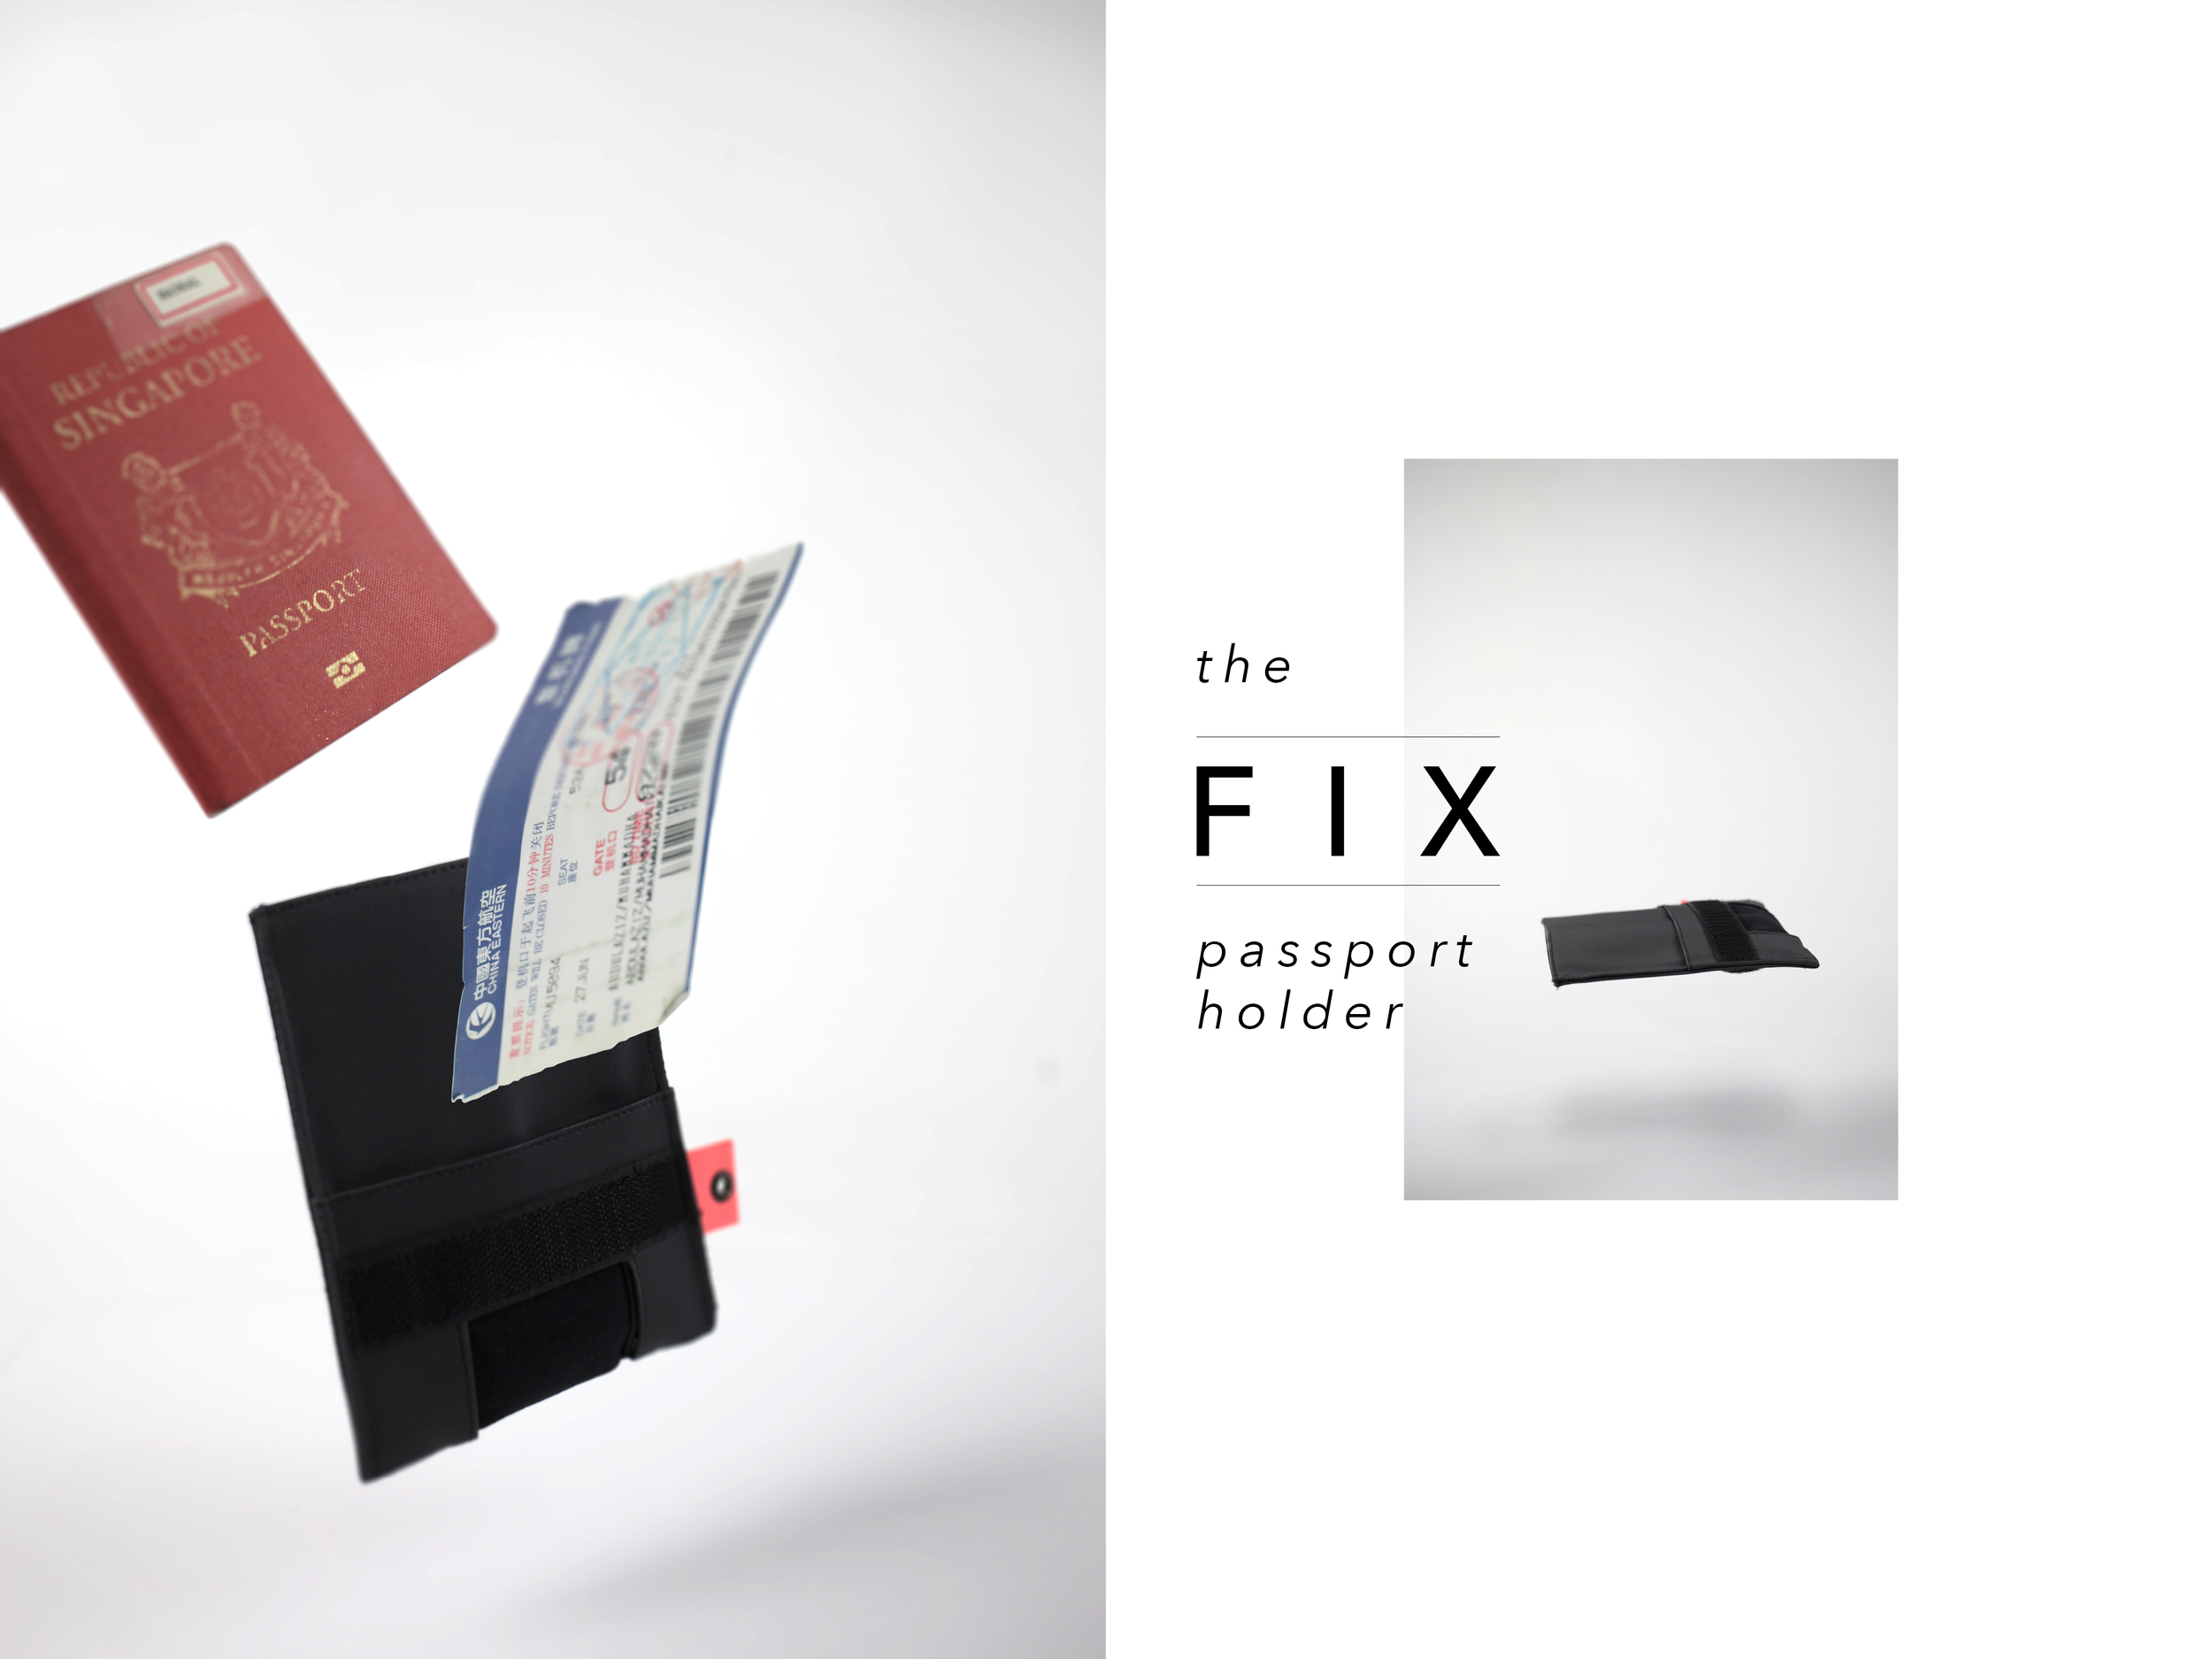 FIX photos18.jpg